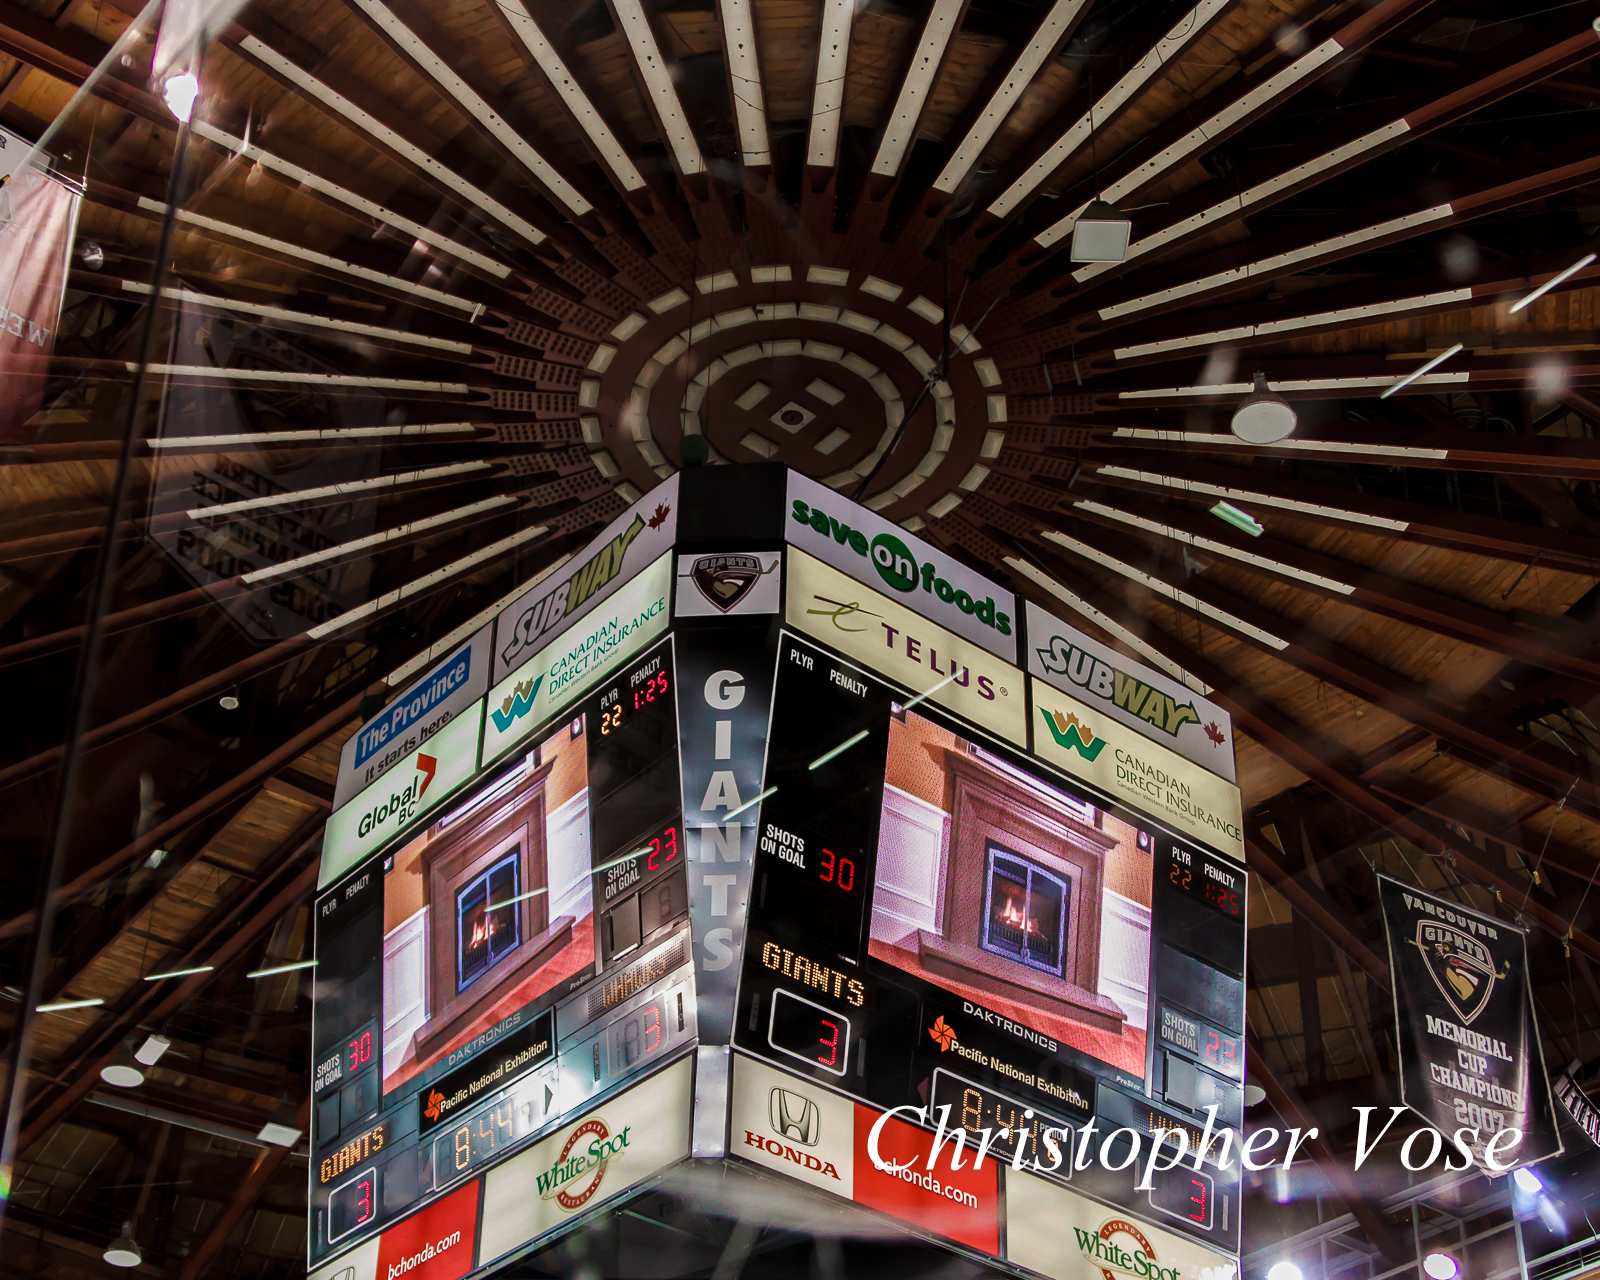 2014-09-26 Pacific Coliseum.jpg